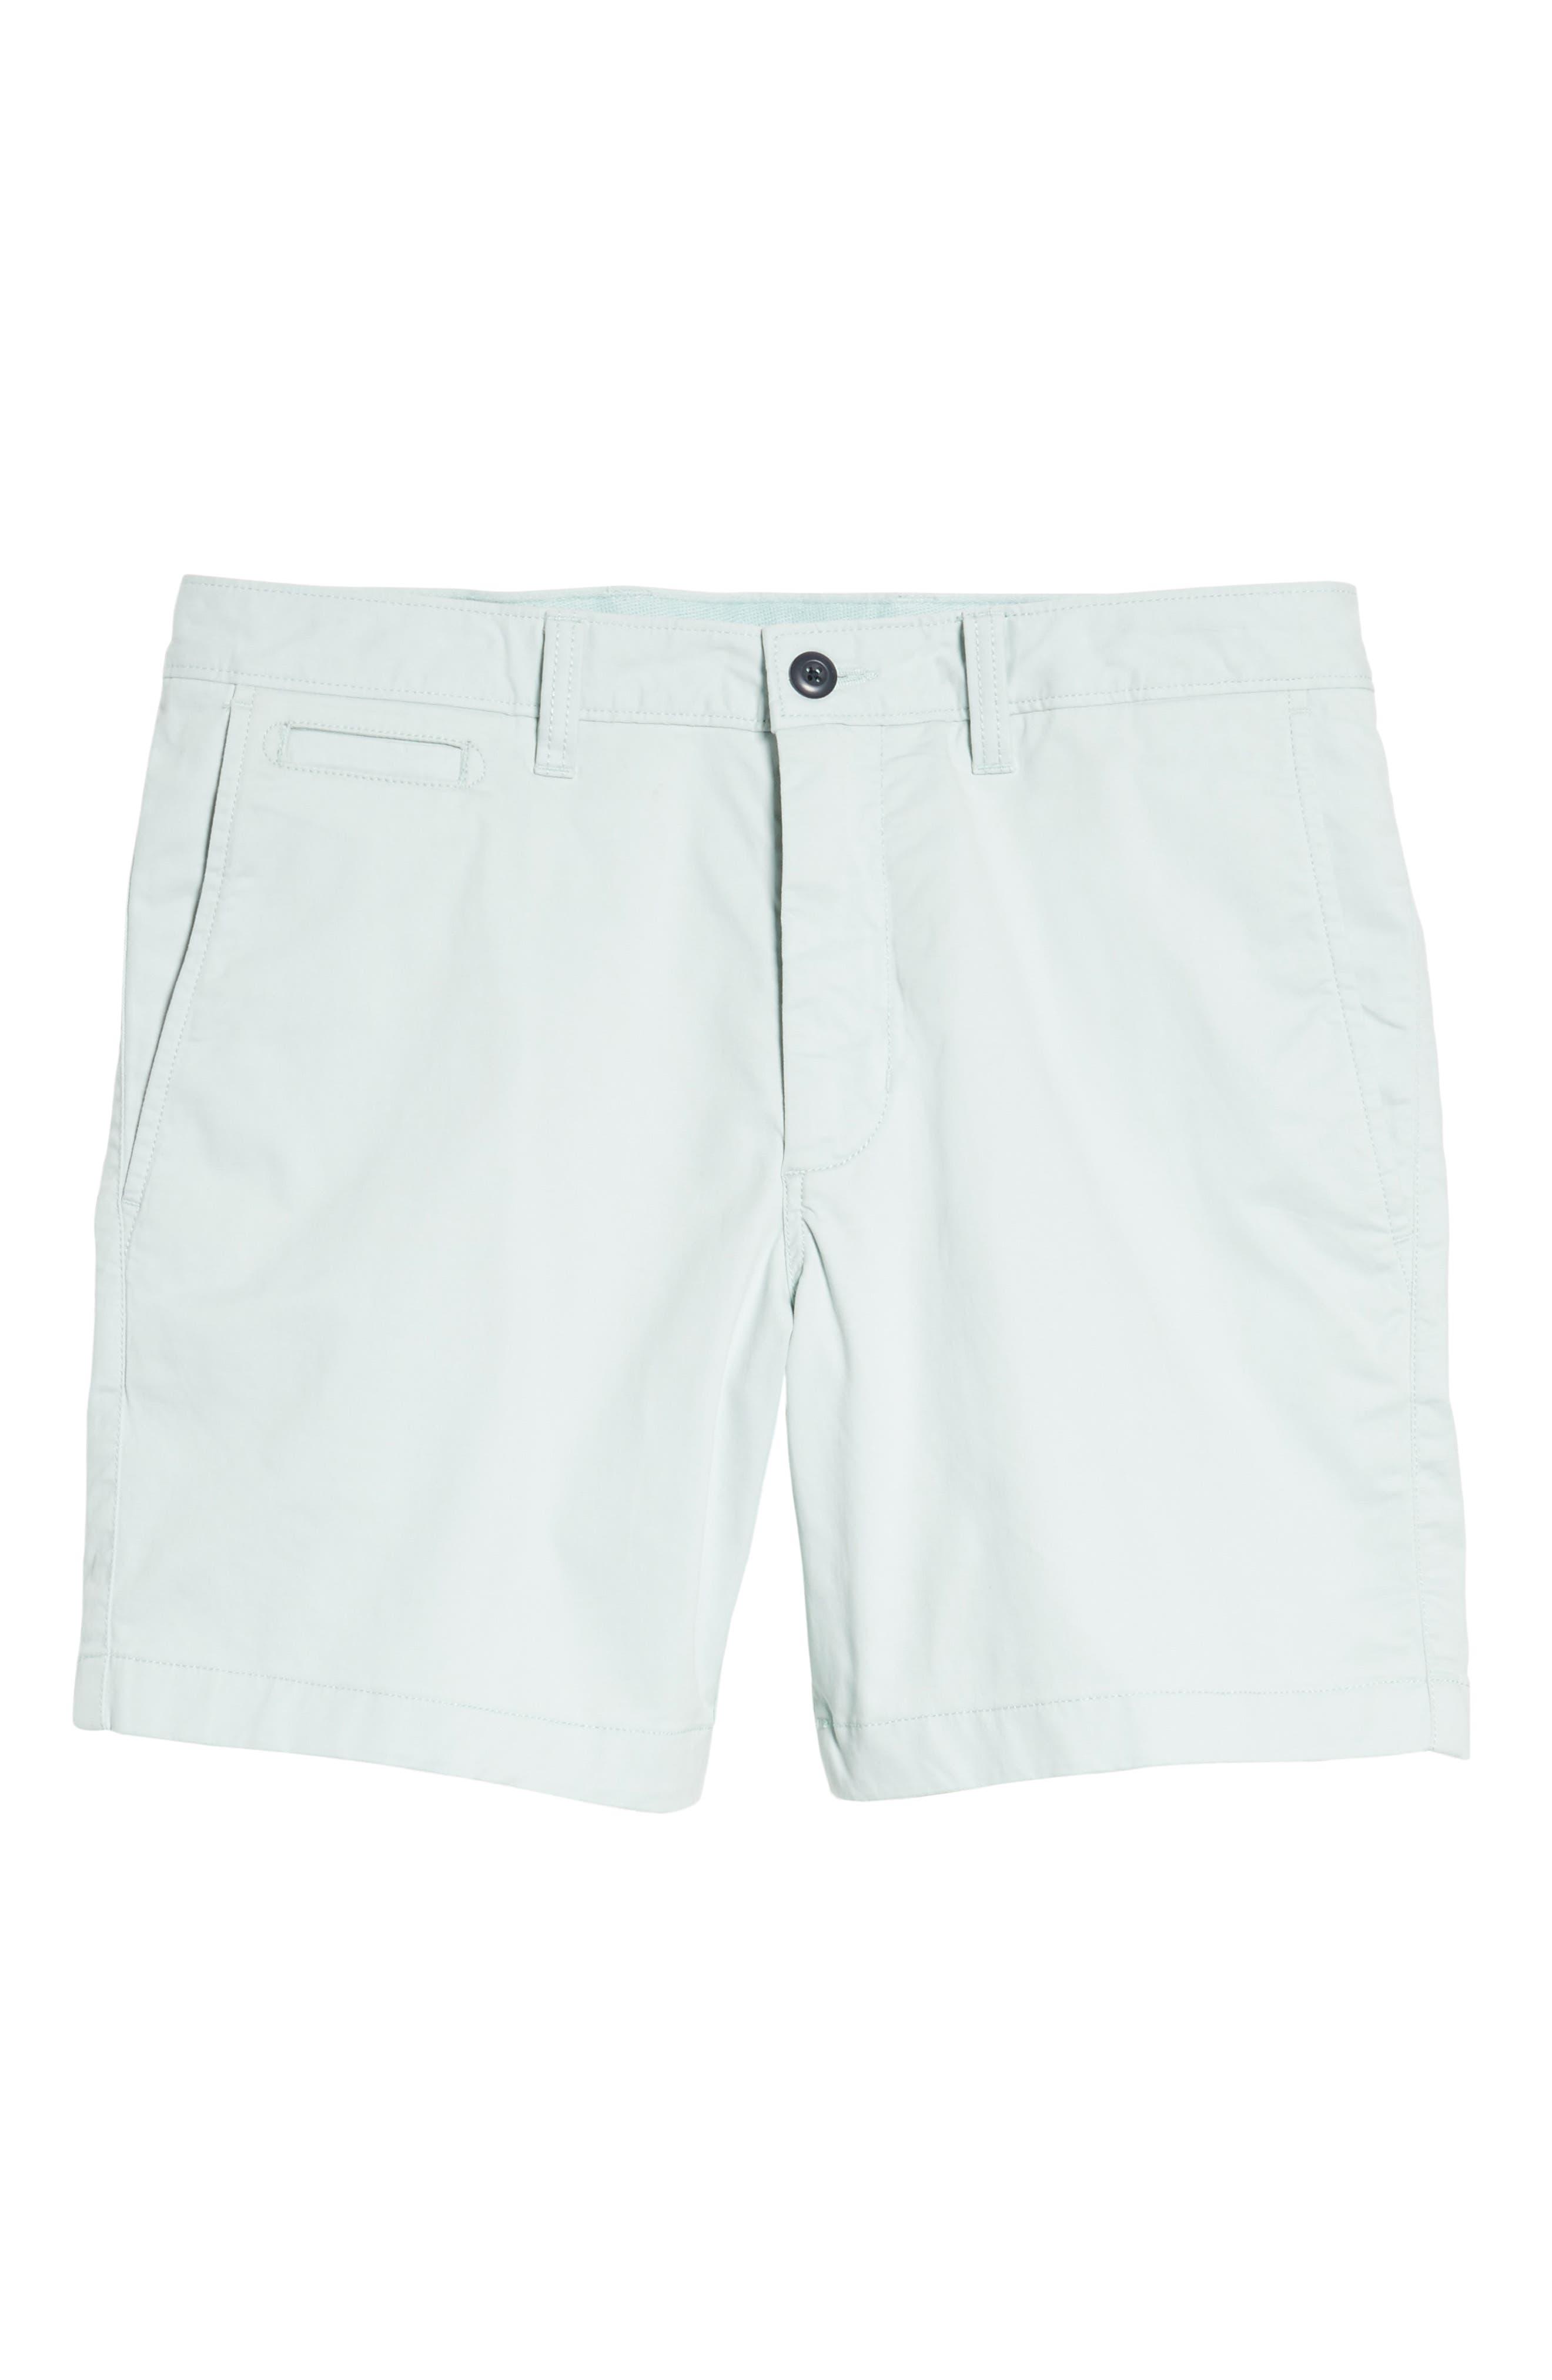 Ballard Slim Fit Stretch Chino 7-Inch Shorts,                             Alternate thumbnail 68, color,